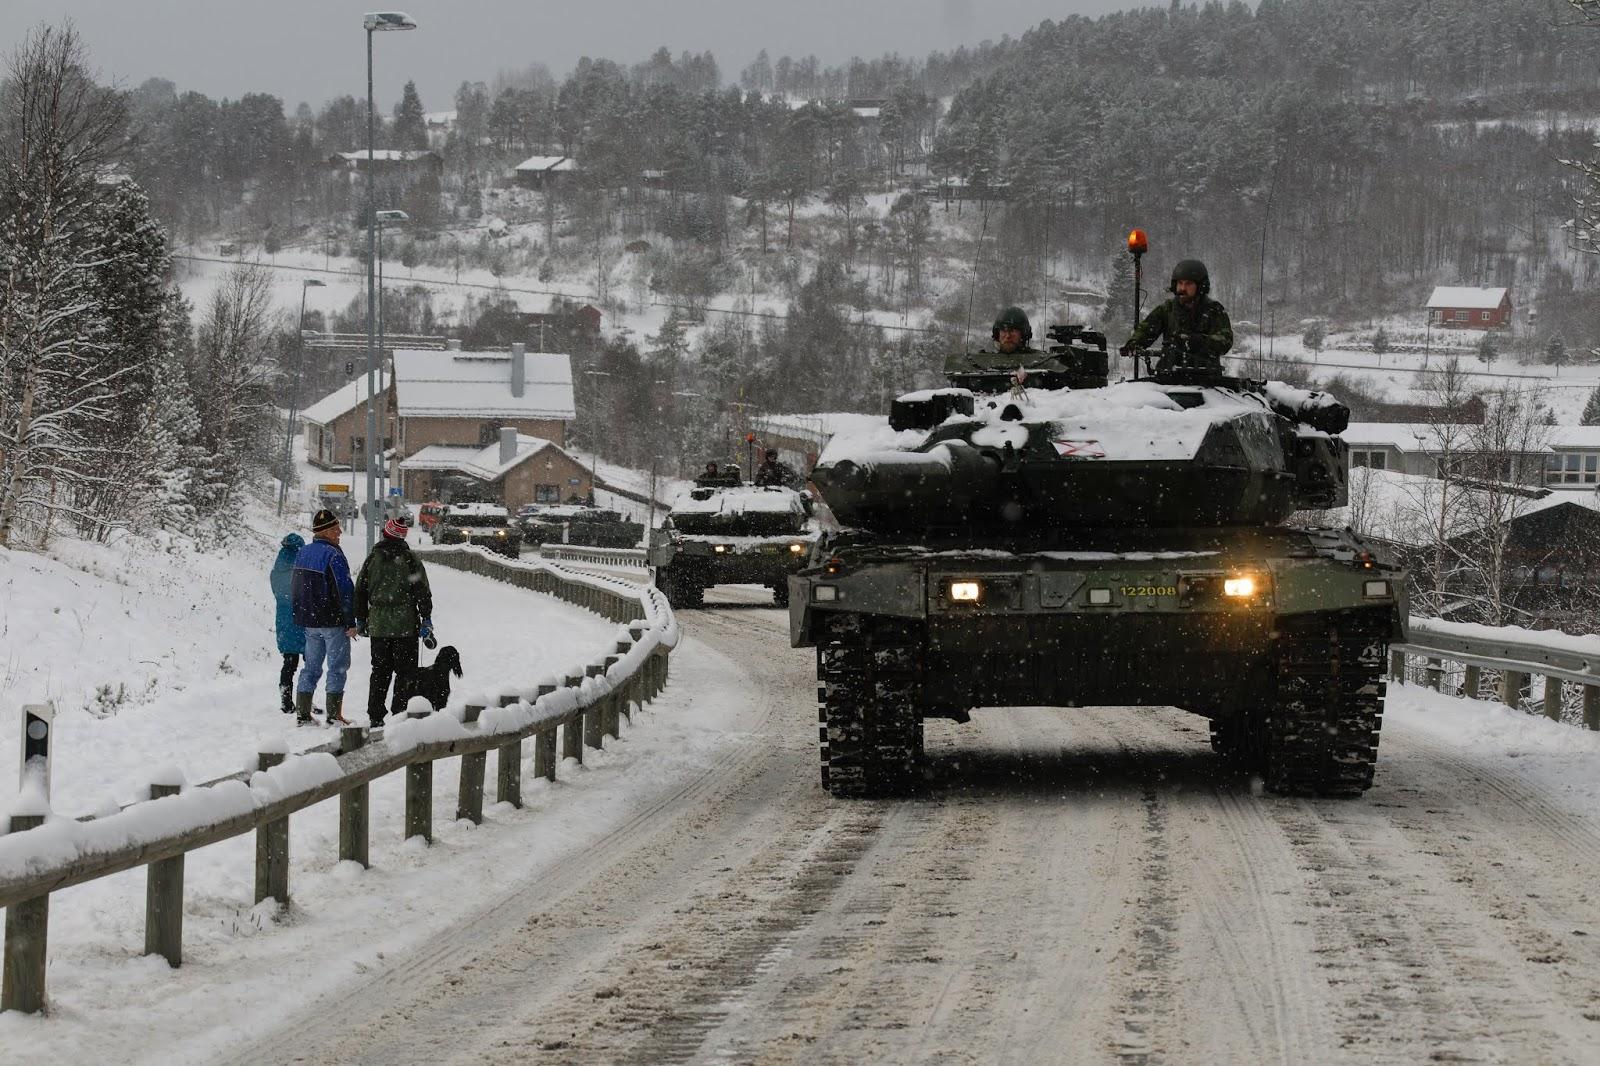 Bara civilt svenskt bistand till haiti